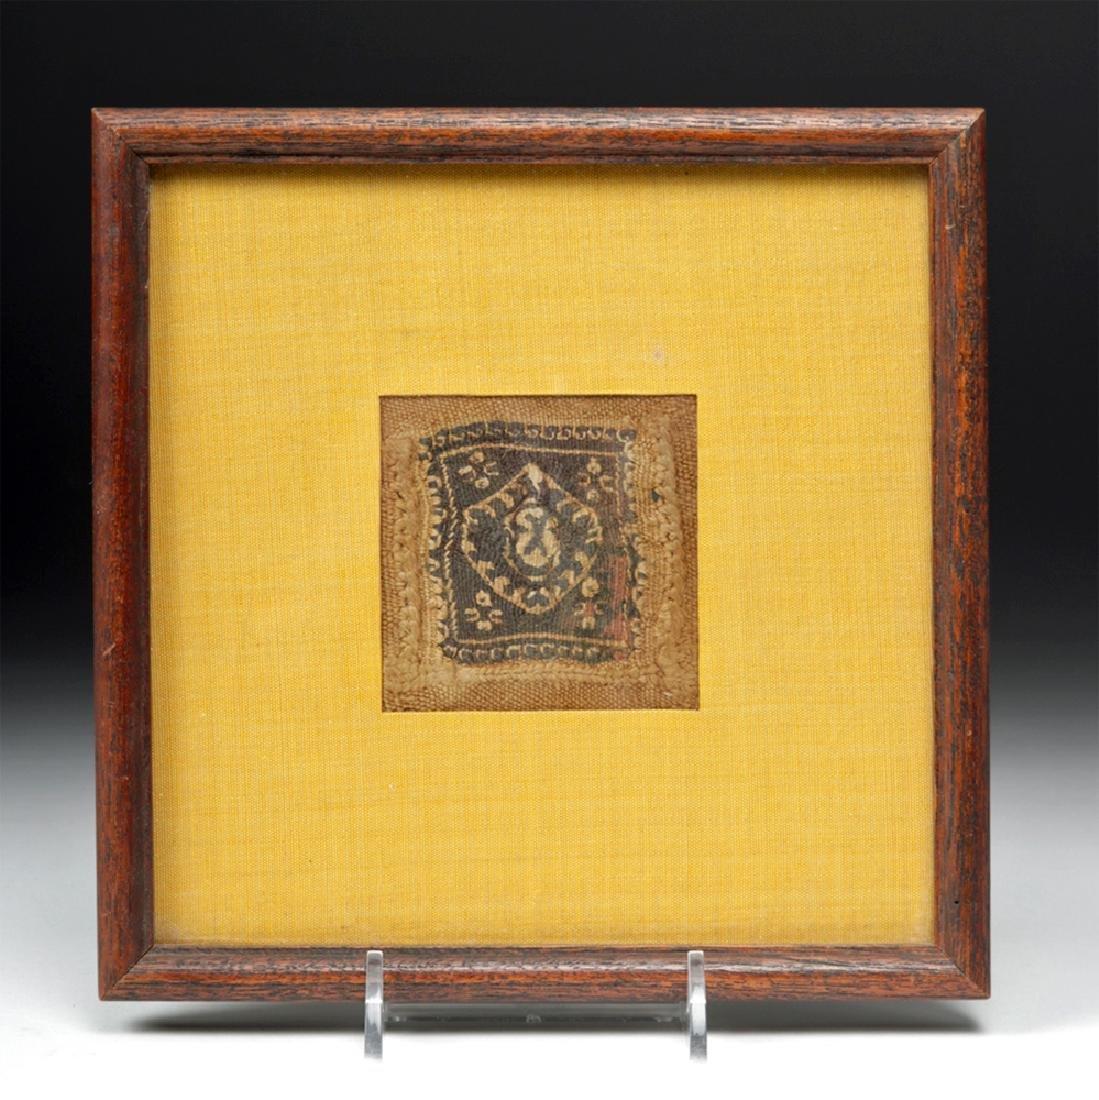 3rd C. Egyptian Textile Coptic Panel - Framed